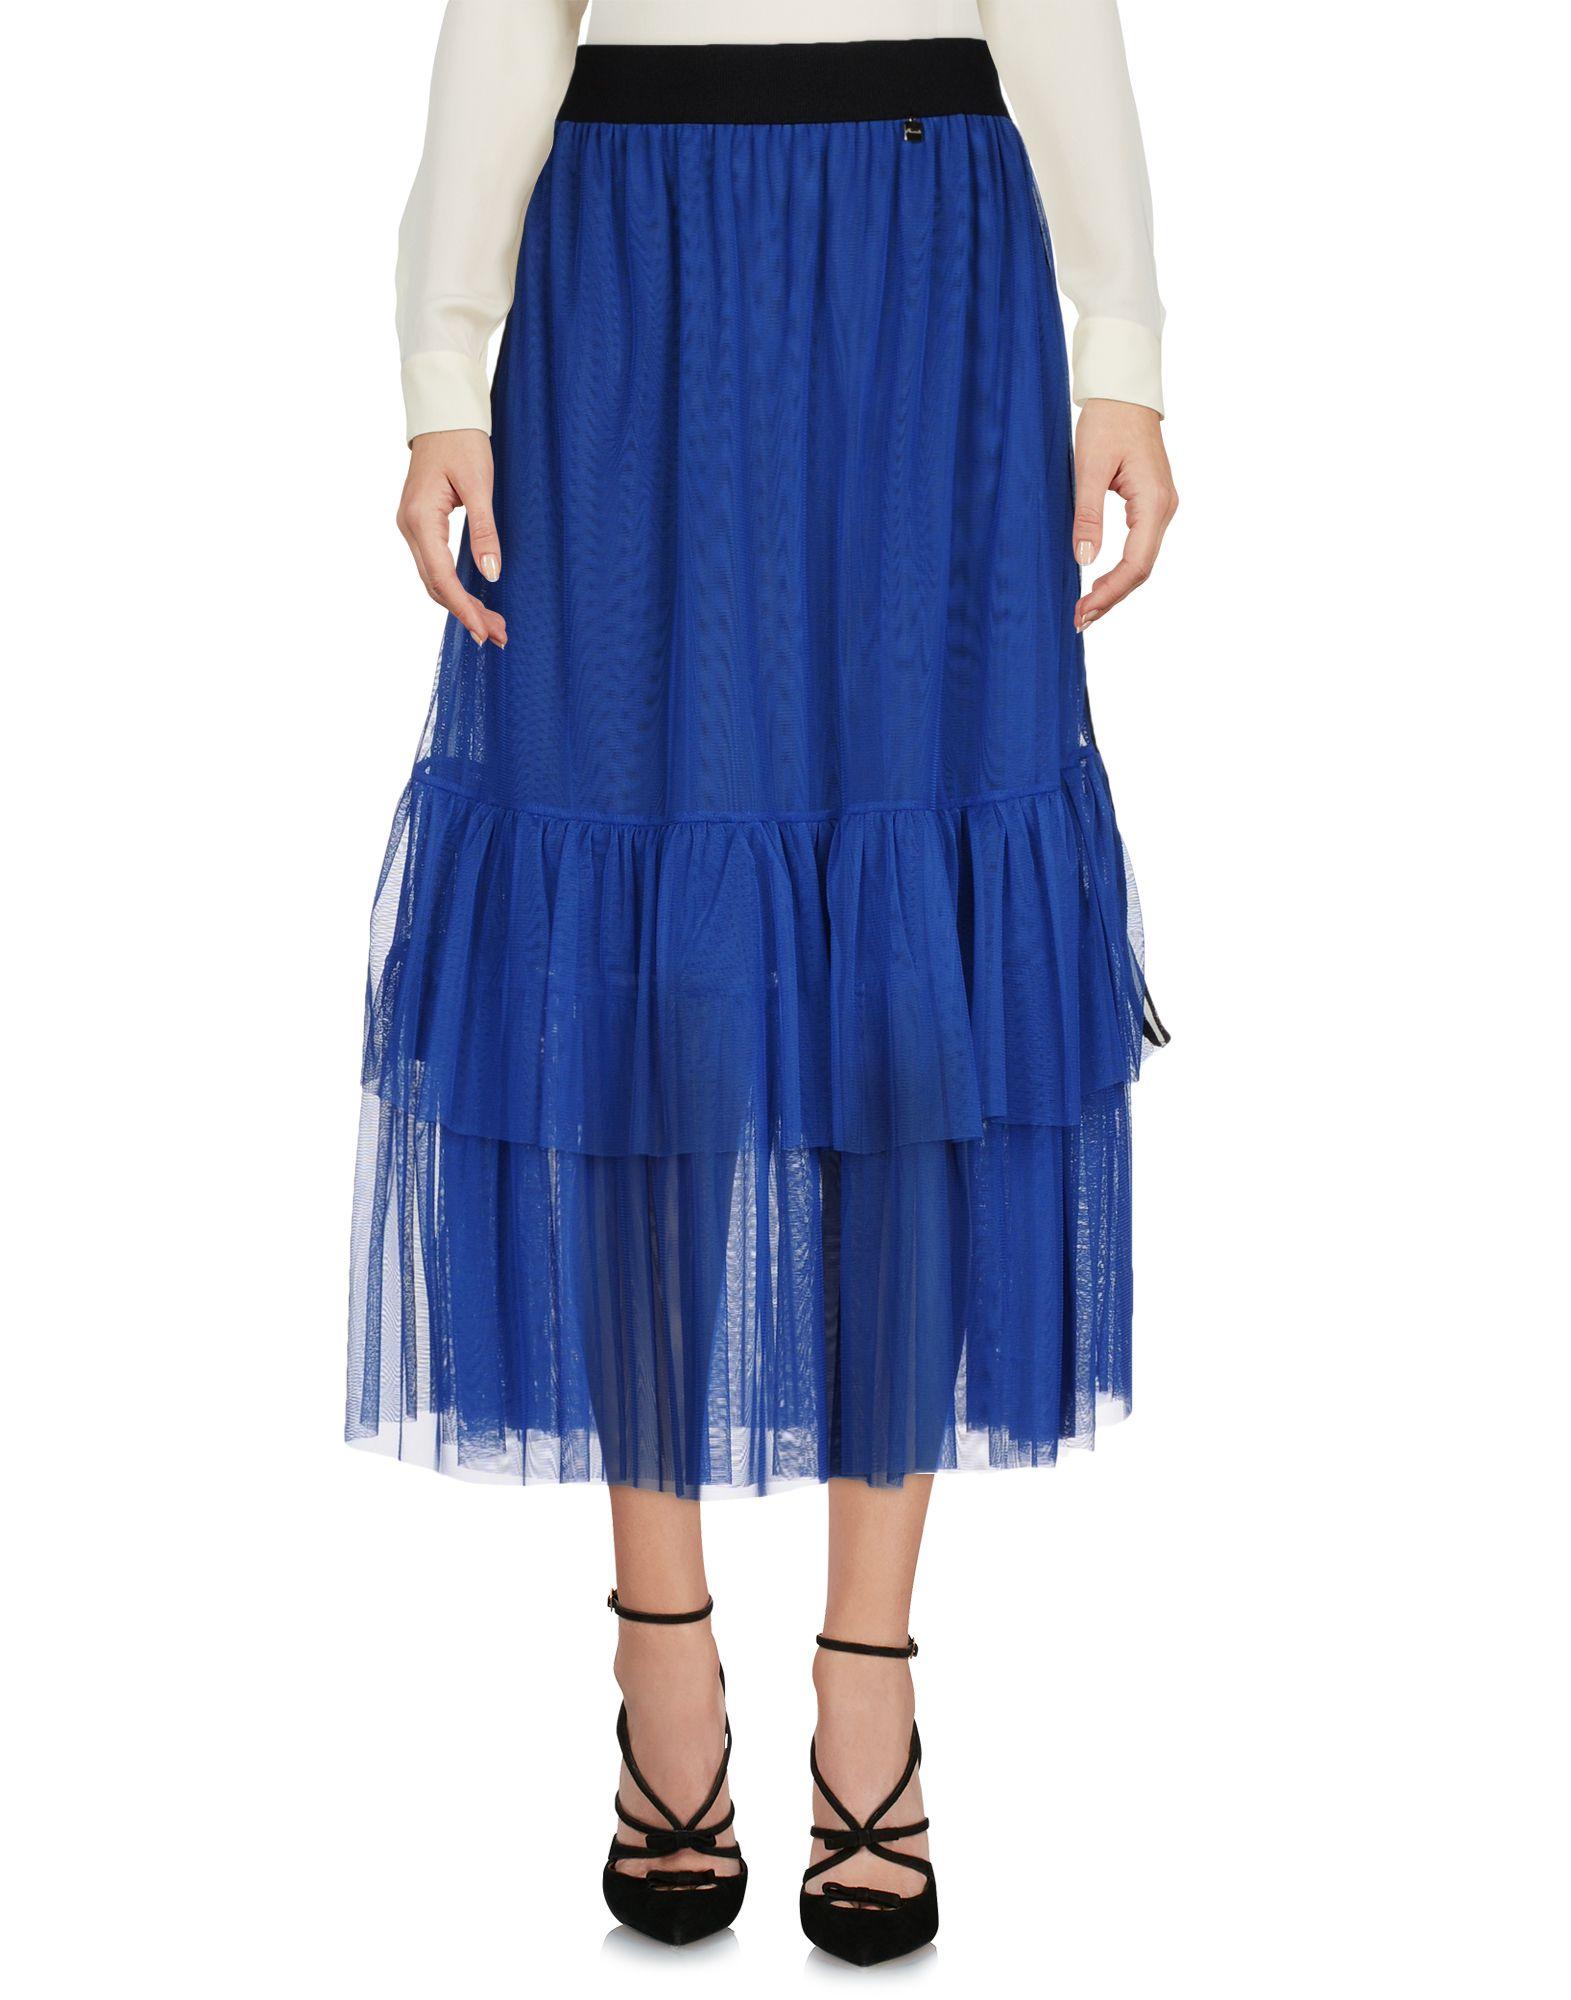 SOUVENIR Юбка длиной 3/4 moschino couture юбка длиной 3 4